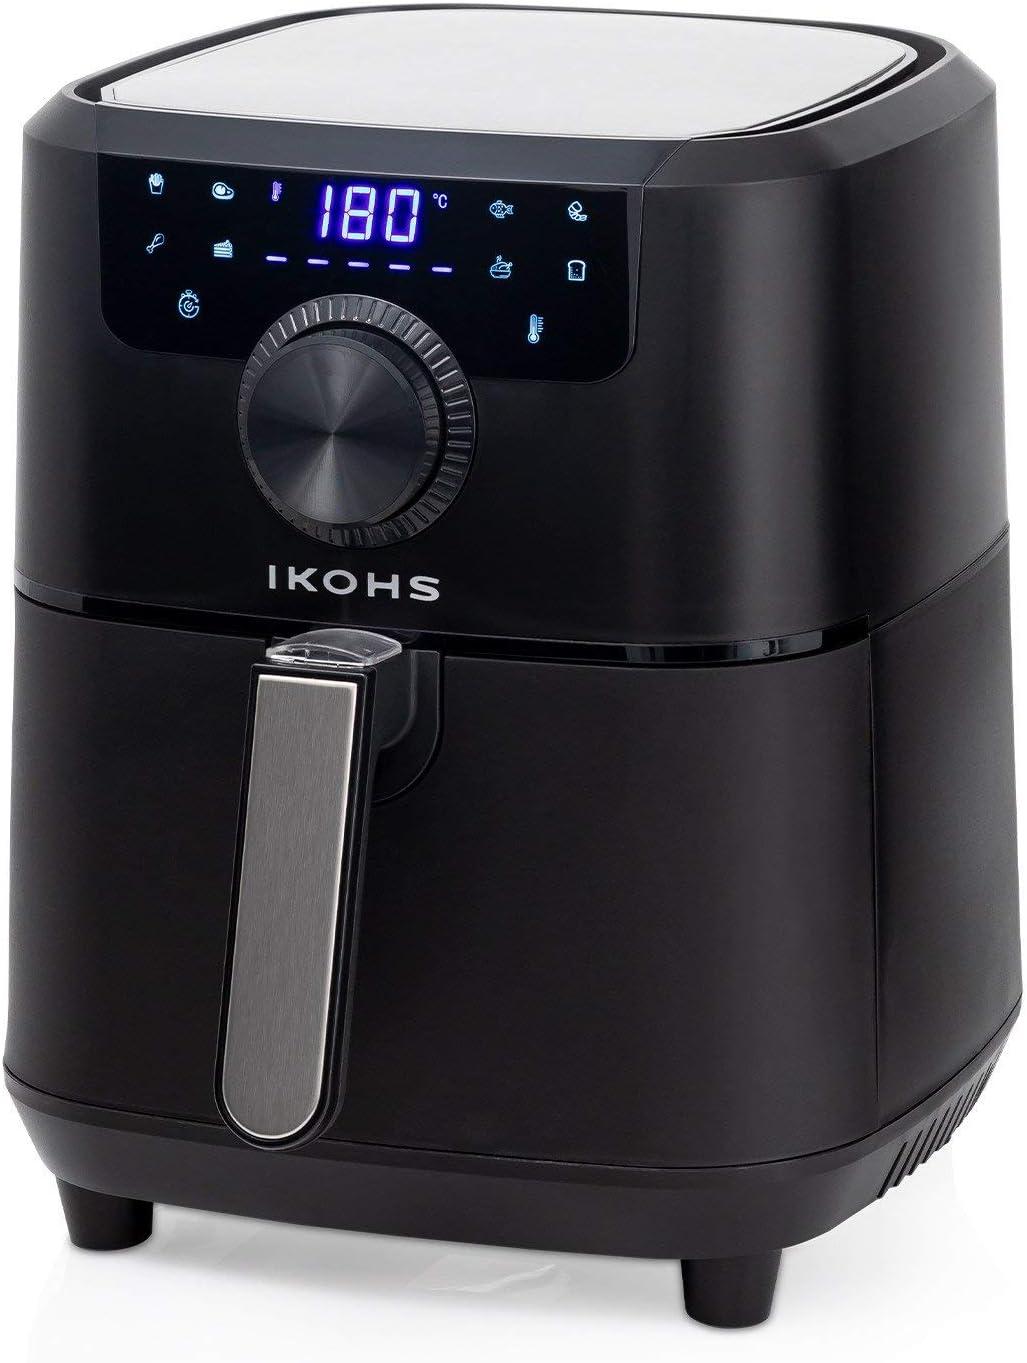 IKOHS HEALTHLY Pro Freidora sin Aceite, Cocina sin Aceite, 8 Programas Preinstalados, 3,5 l, 1500W, Cesta Antiadherente, Temperatura Cocción 80-200°, Apagado automático, Programable (Negro)